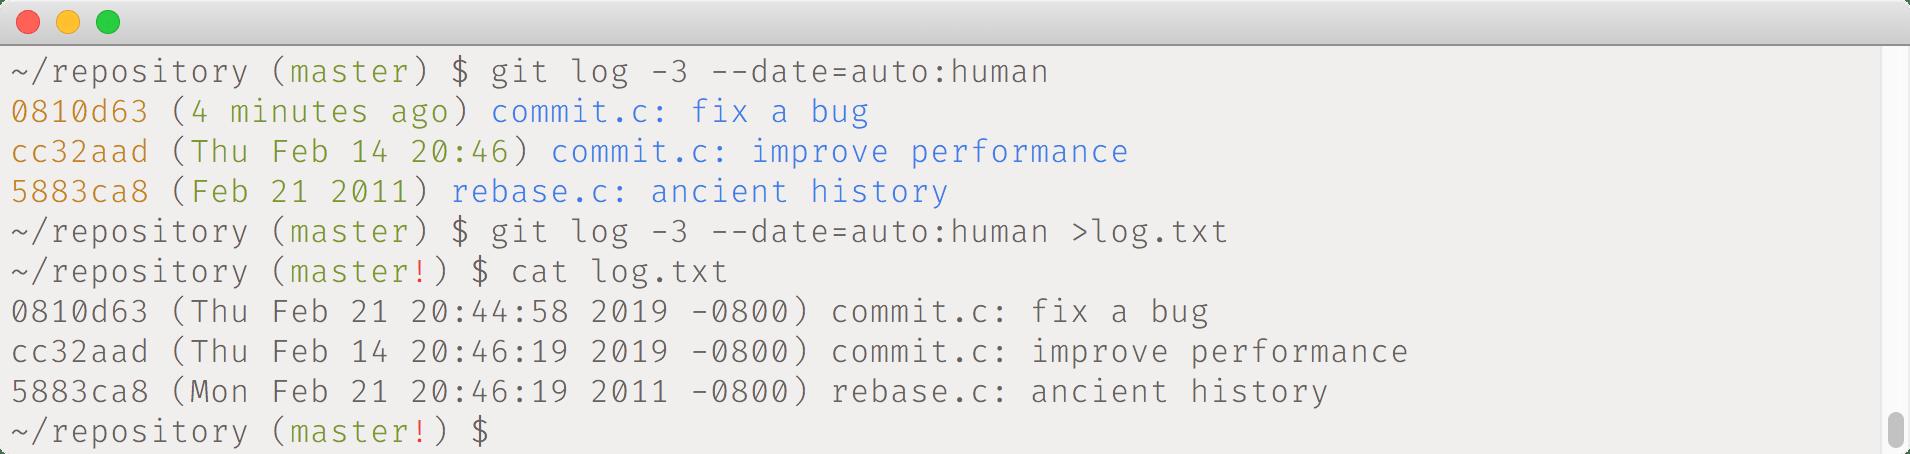 git log --date=auto:human example